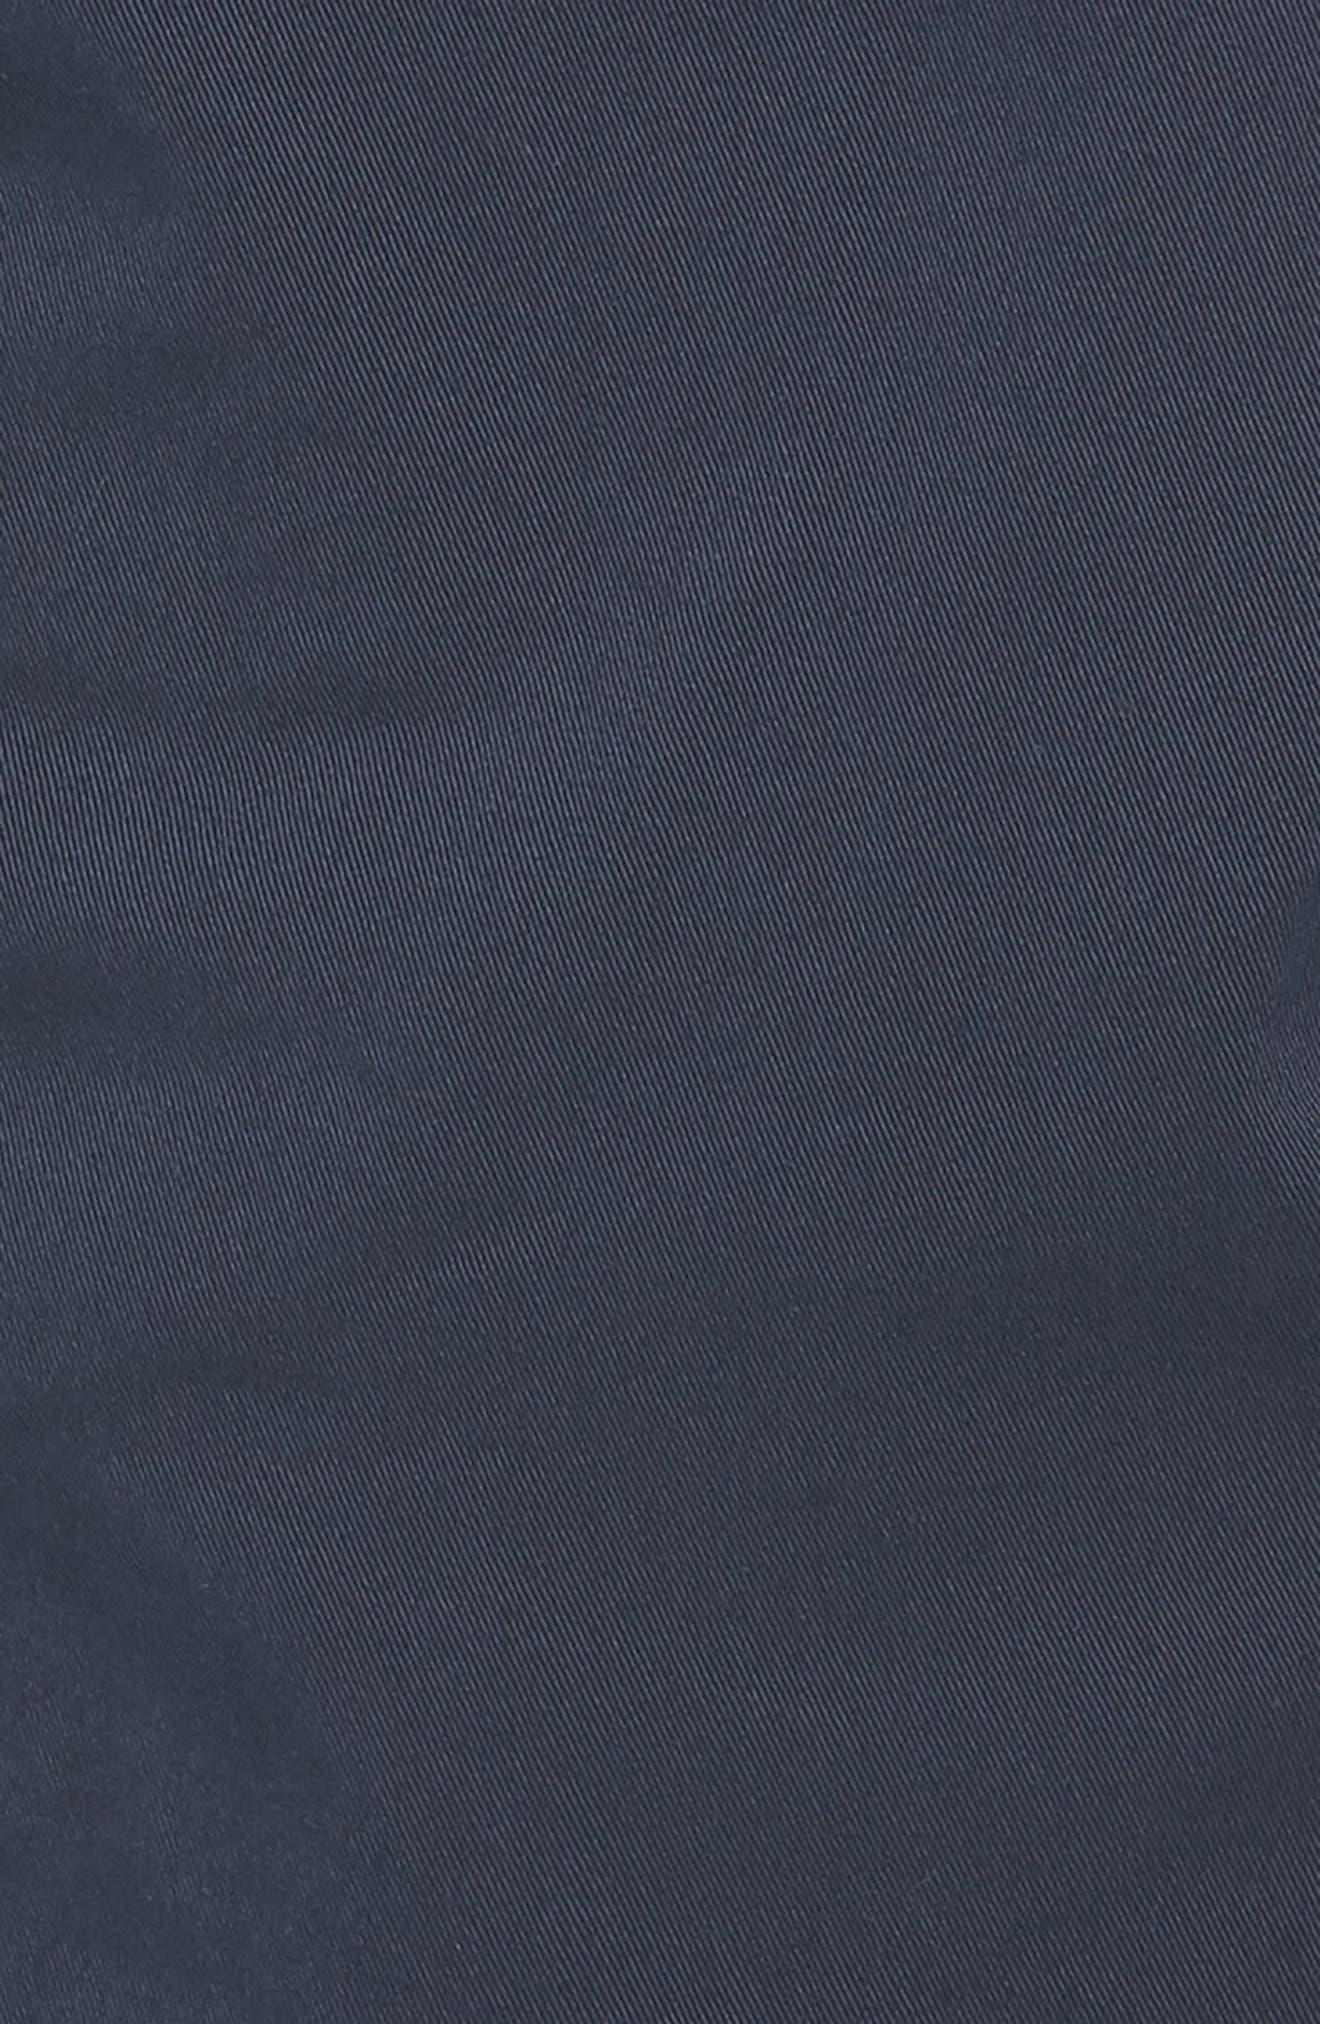 St. Barts Twill Shorts,                             Alternate thumbnail 57, color,